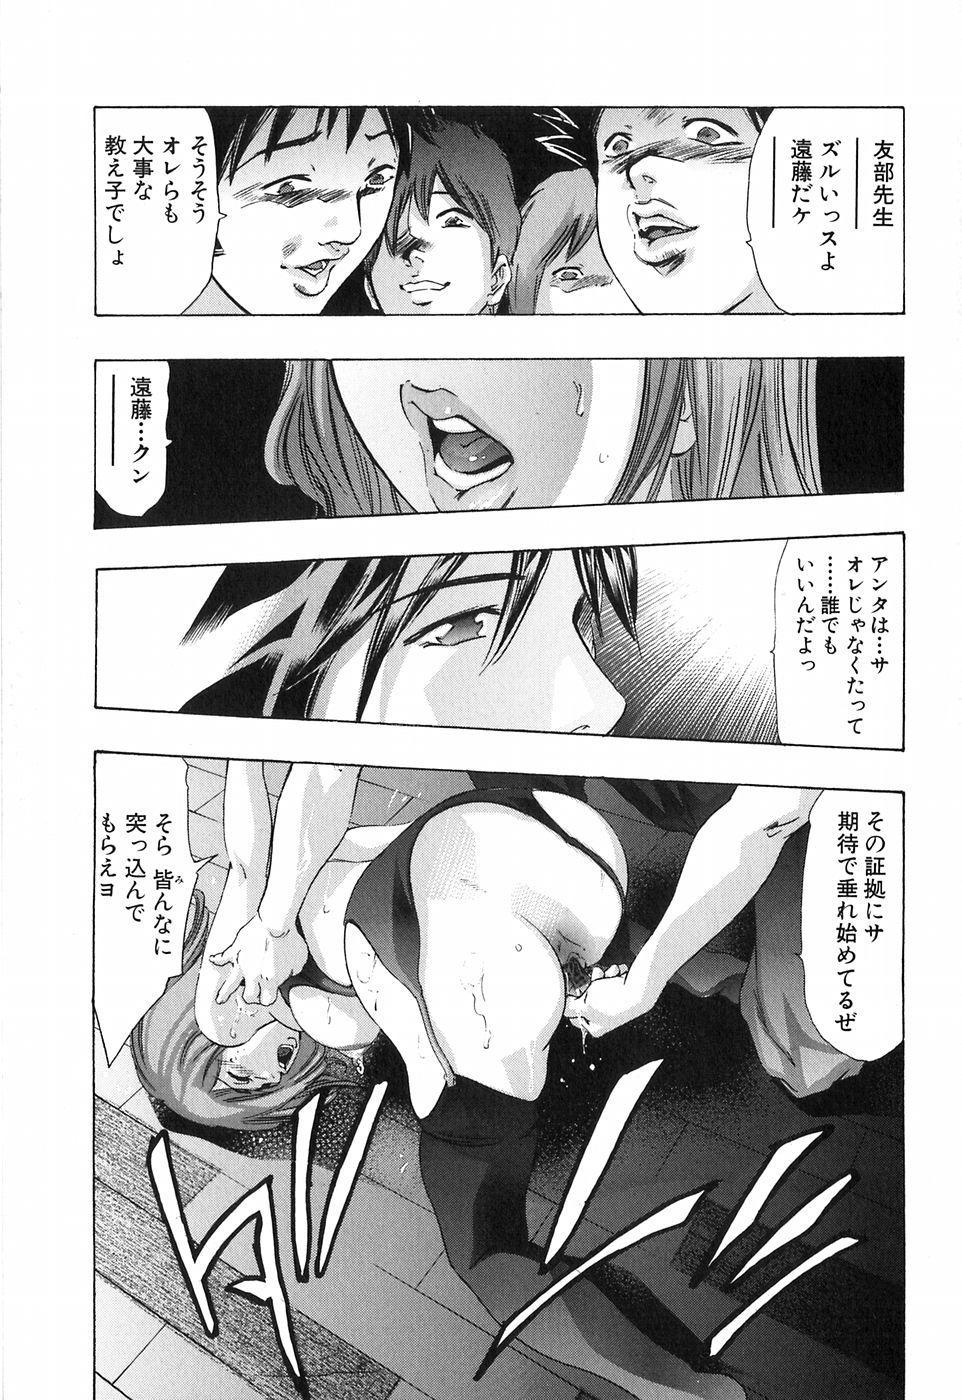 Uchi Naru Koe - Voice which becomes inside 40